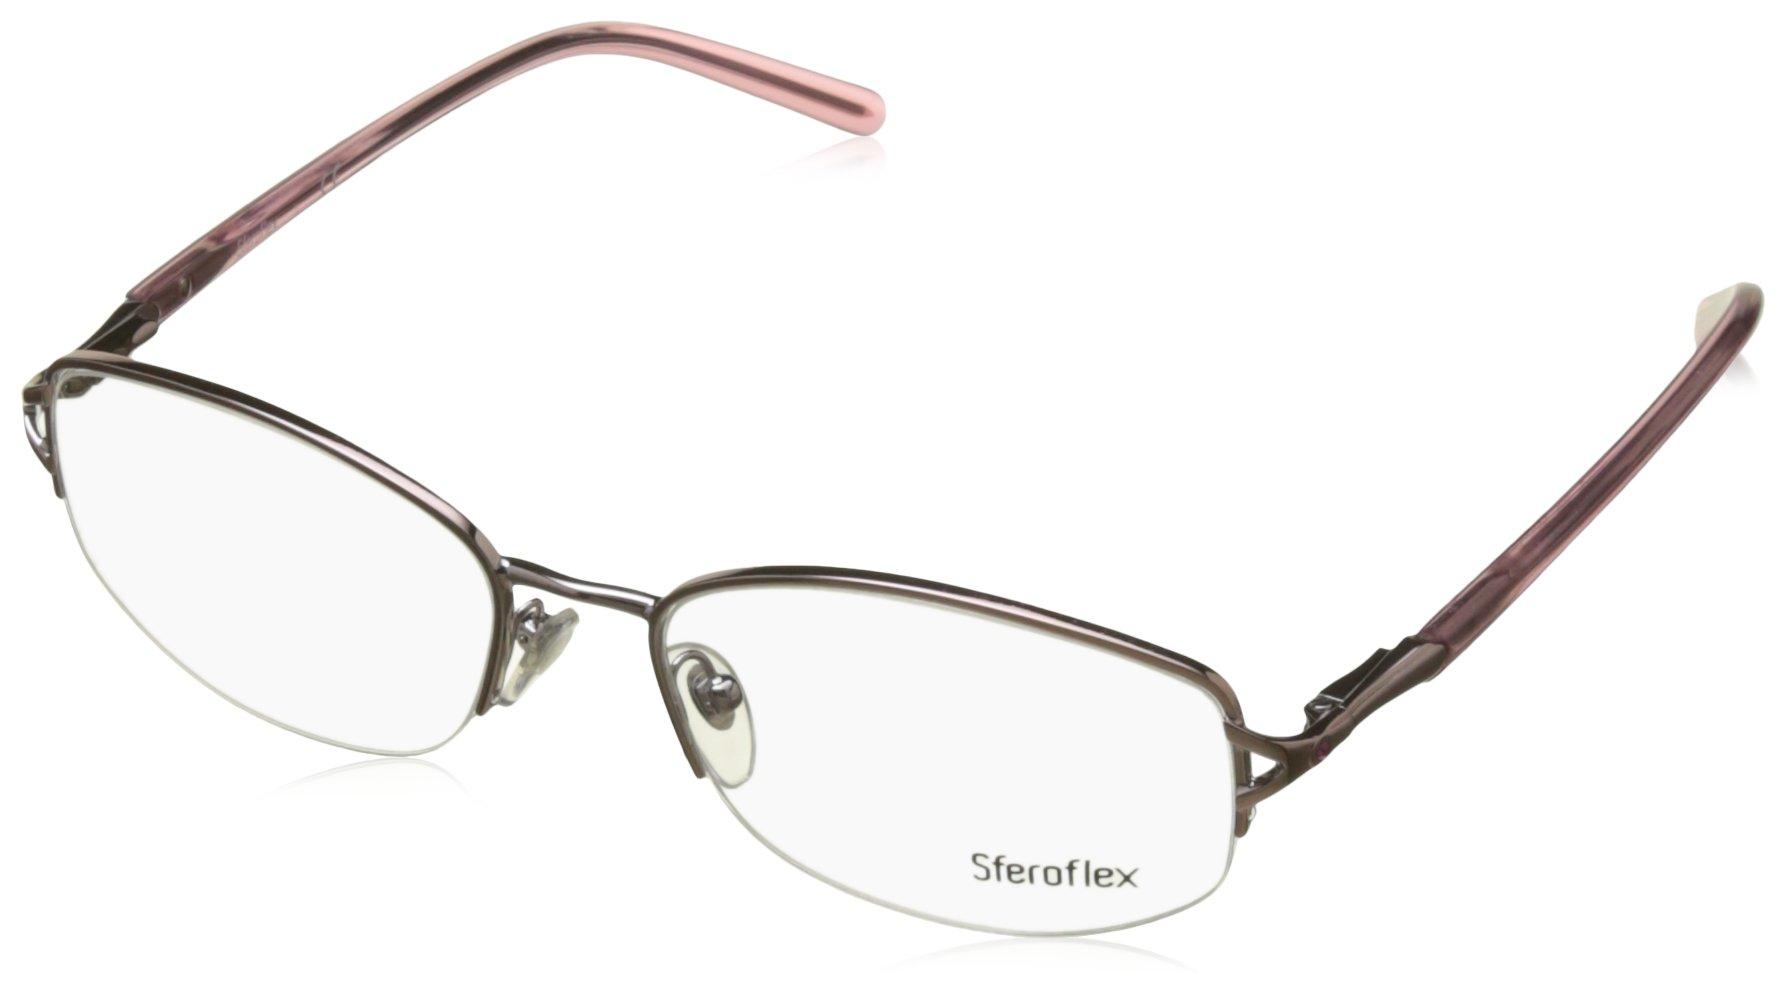 Sferoflex SF 2550B Eyeglasses Styles Light Pink Frame w/Non-Rx 53 mm Diameter Lenses, 299-5317,